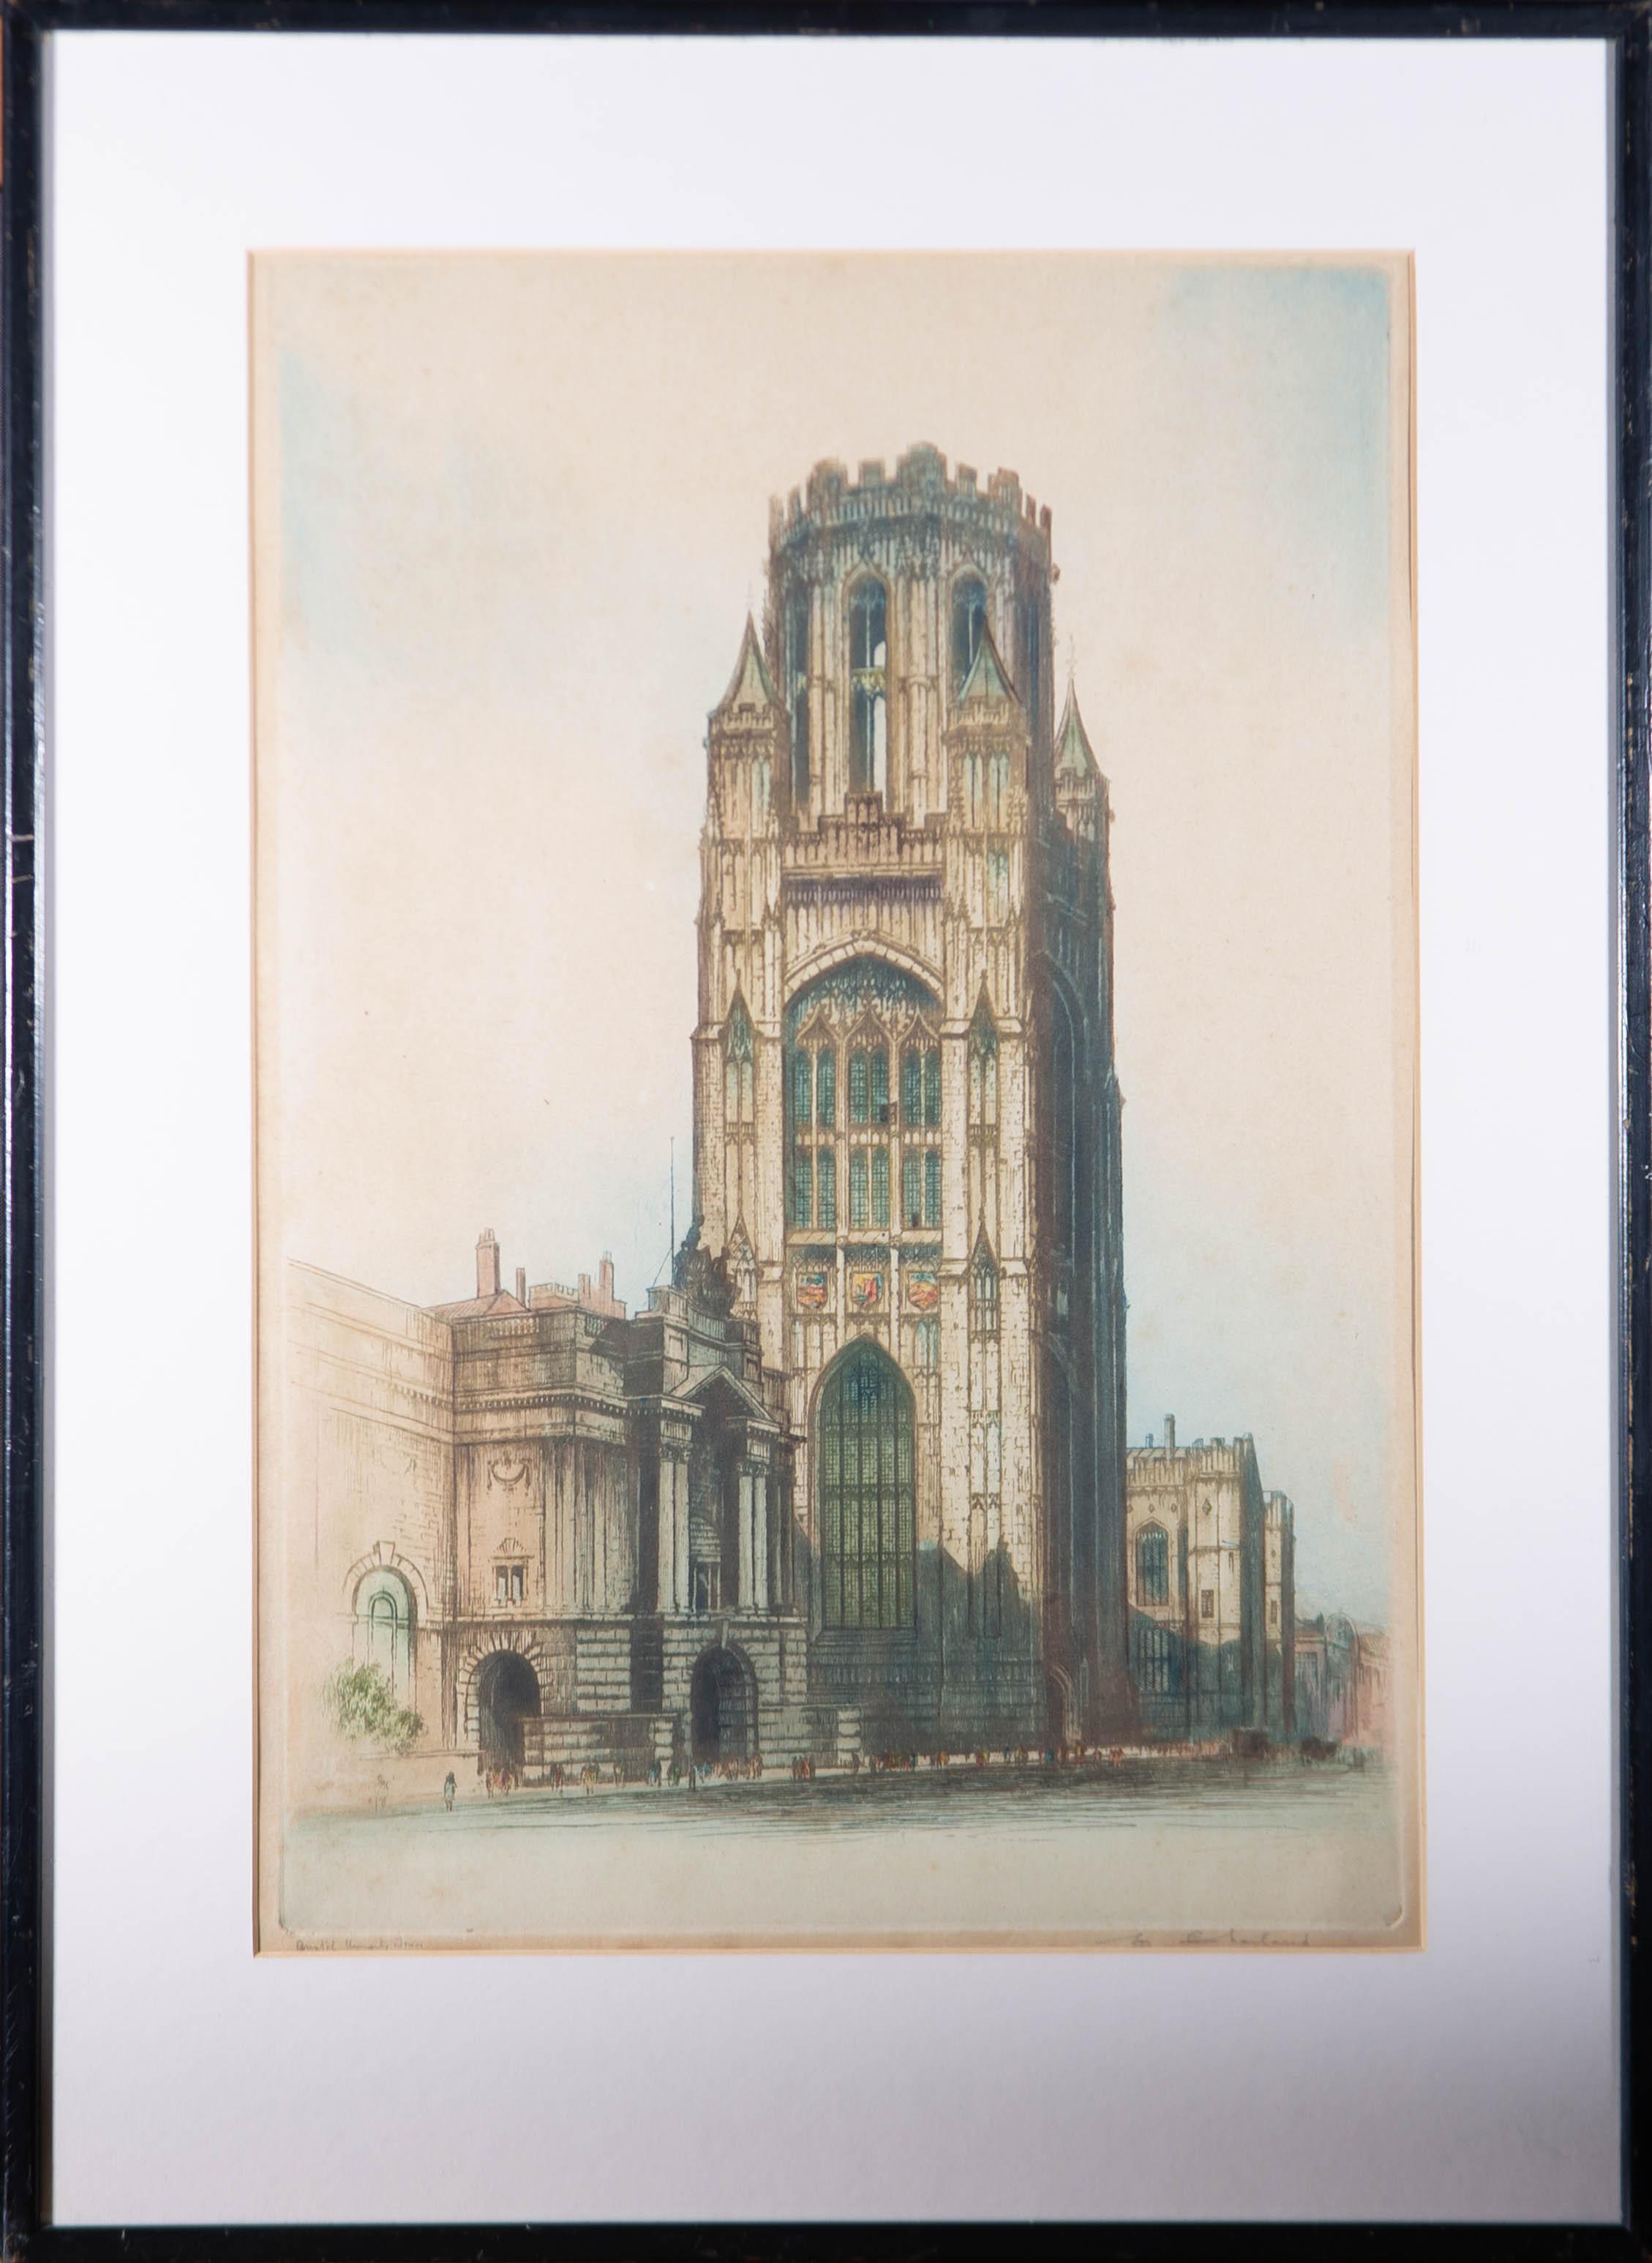 Edward Sharland (1884-1967) - Early 20th Century Etching, Bristol University